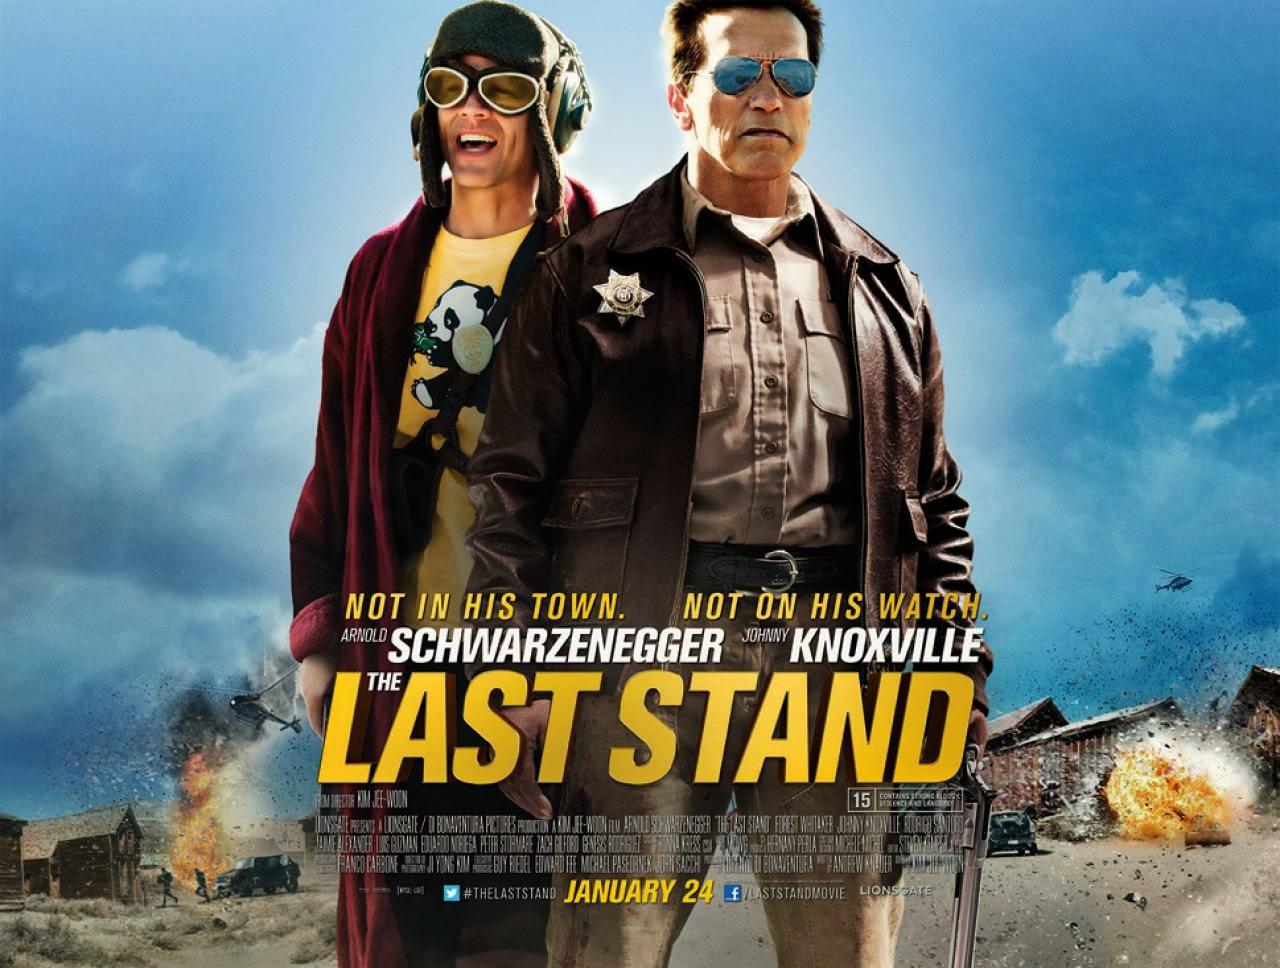 http://1.bp.blogspot.com/-6Naqt4-_Z44/UP1_JHIT8sI/AAAAAAAABAQ/JDXknsAxzWs/s1600/The-Last-Stand-Poster.jpg